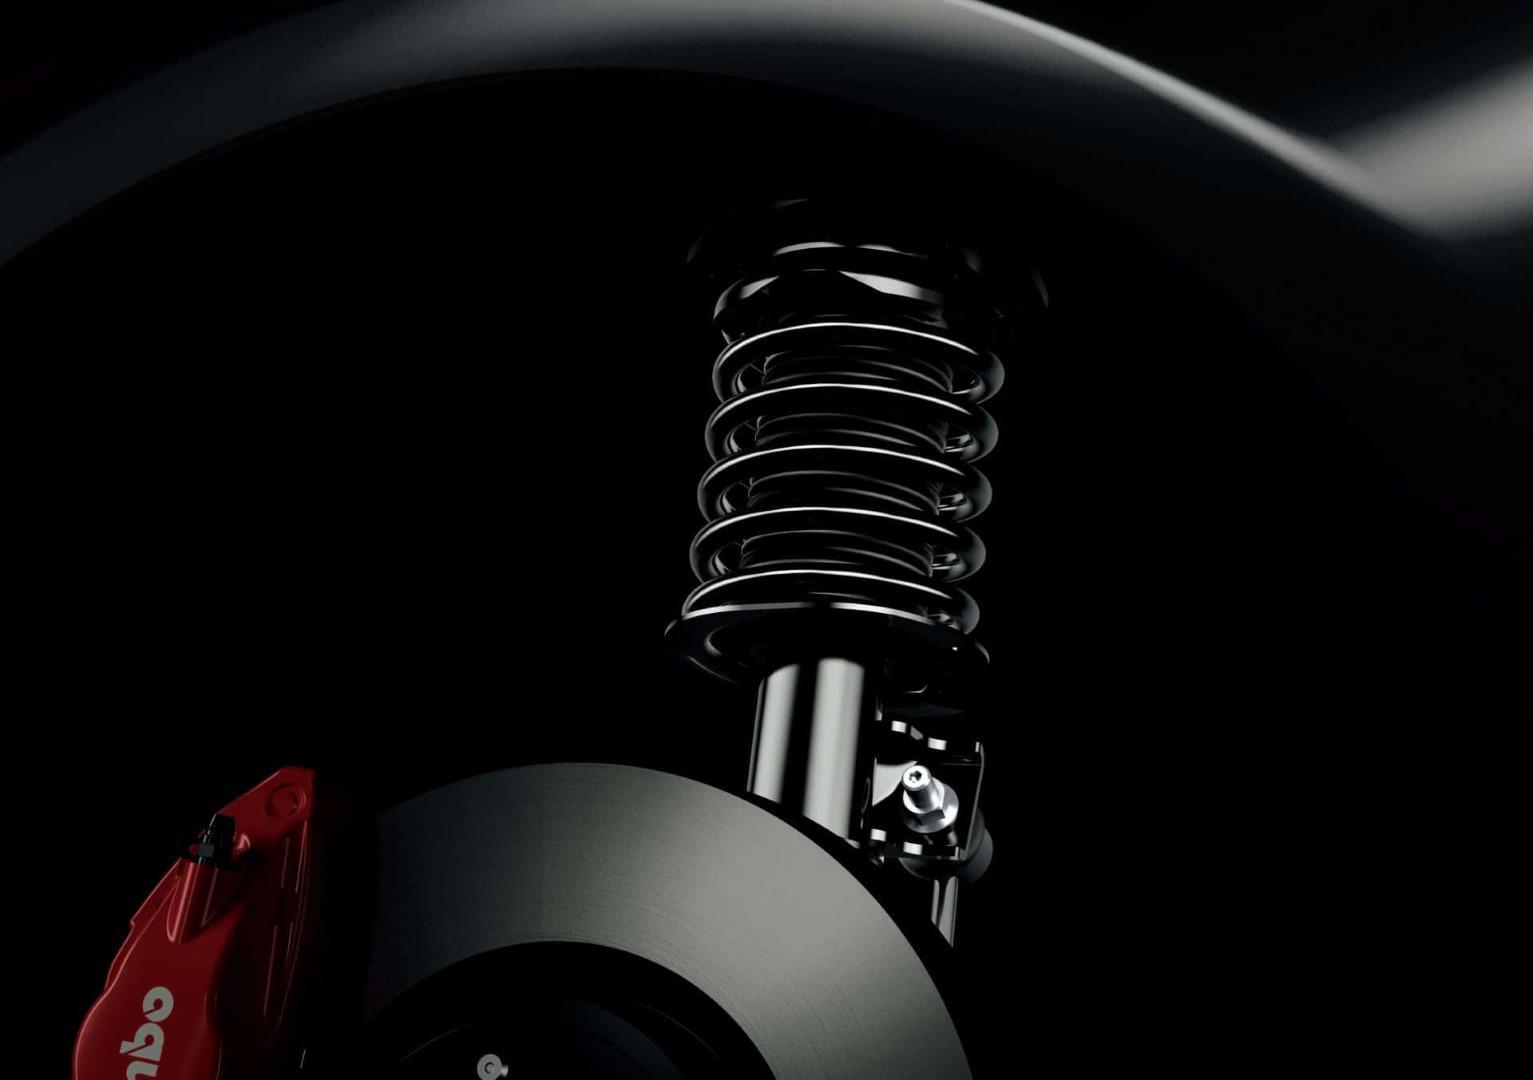 serie-limitee-toyota-gt86-black-limited-1231-6.jpg